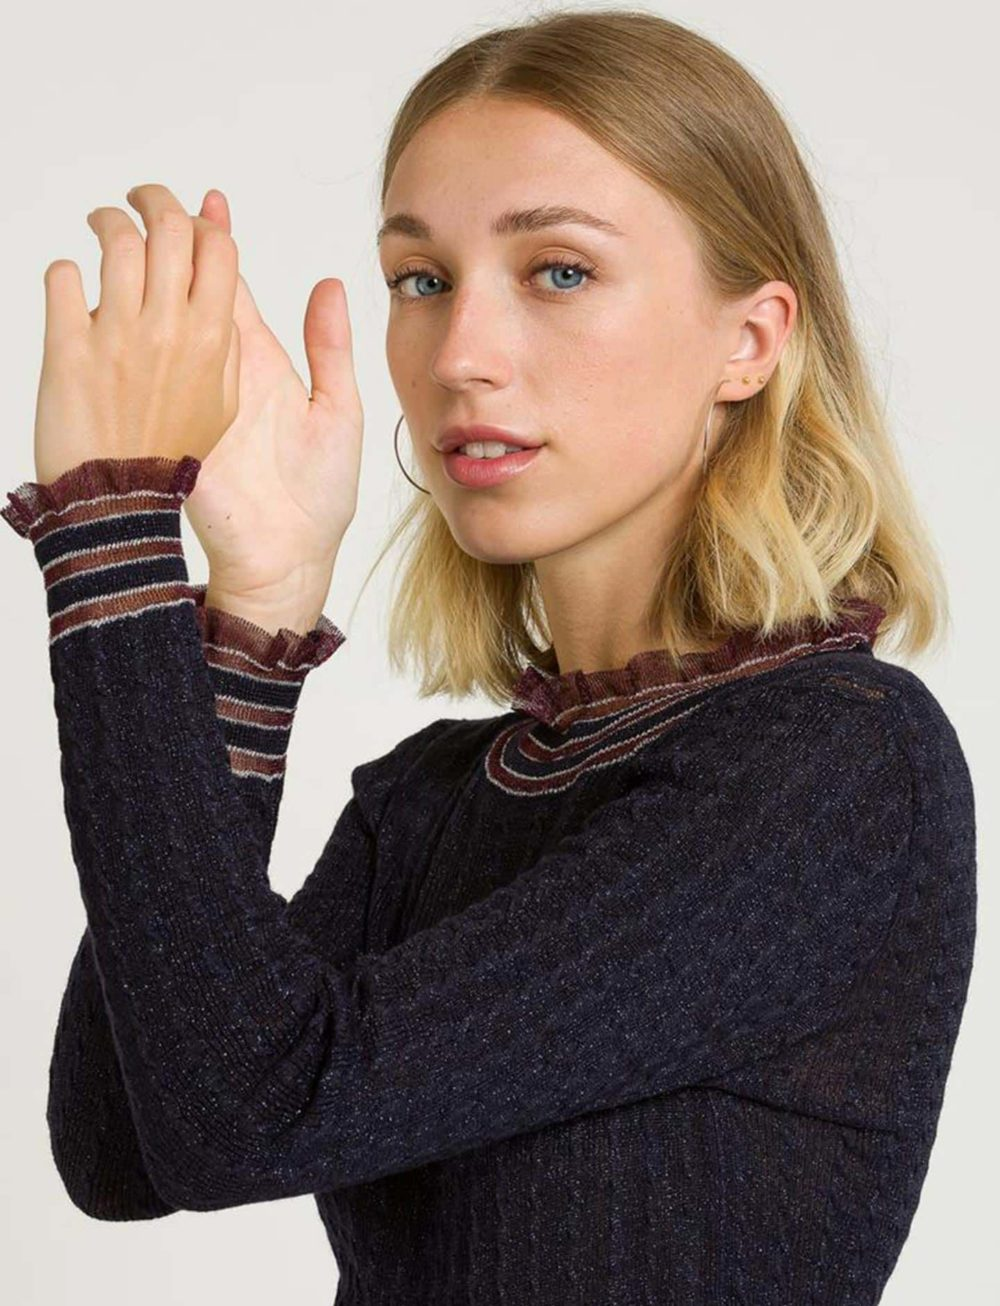 camiseta-brillos-azul-bordeuaux-mangas-cuello